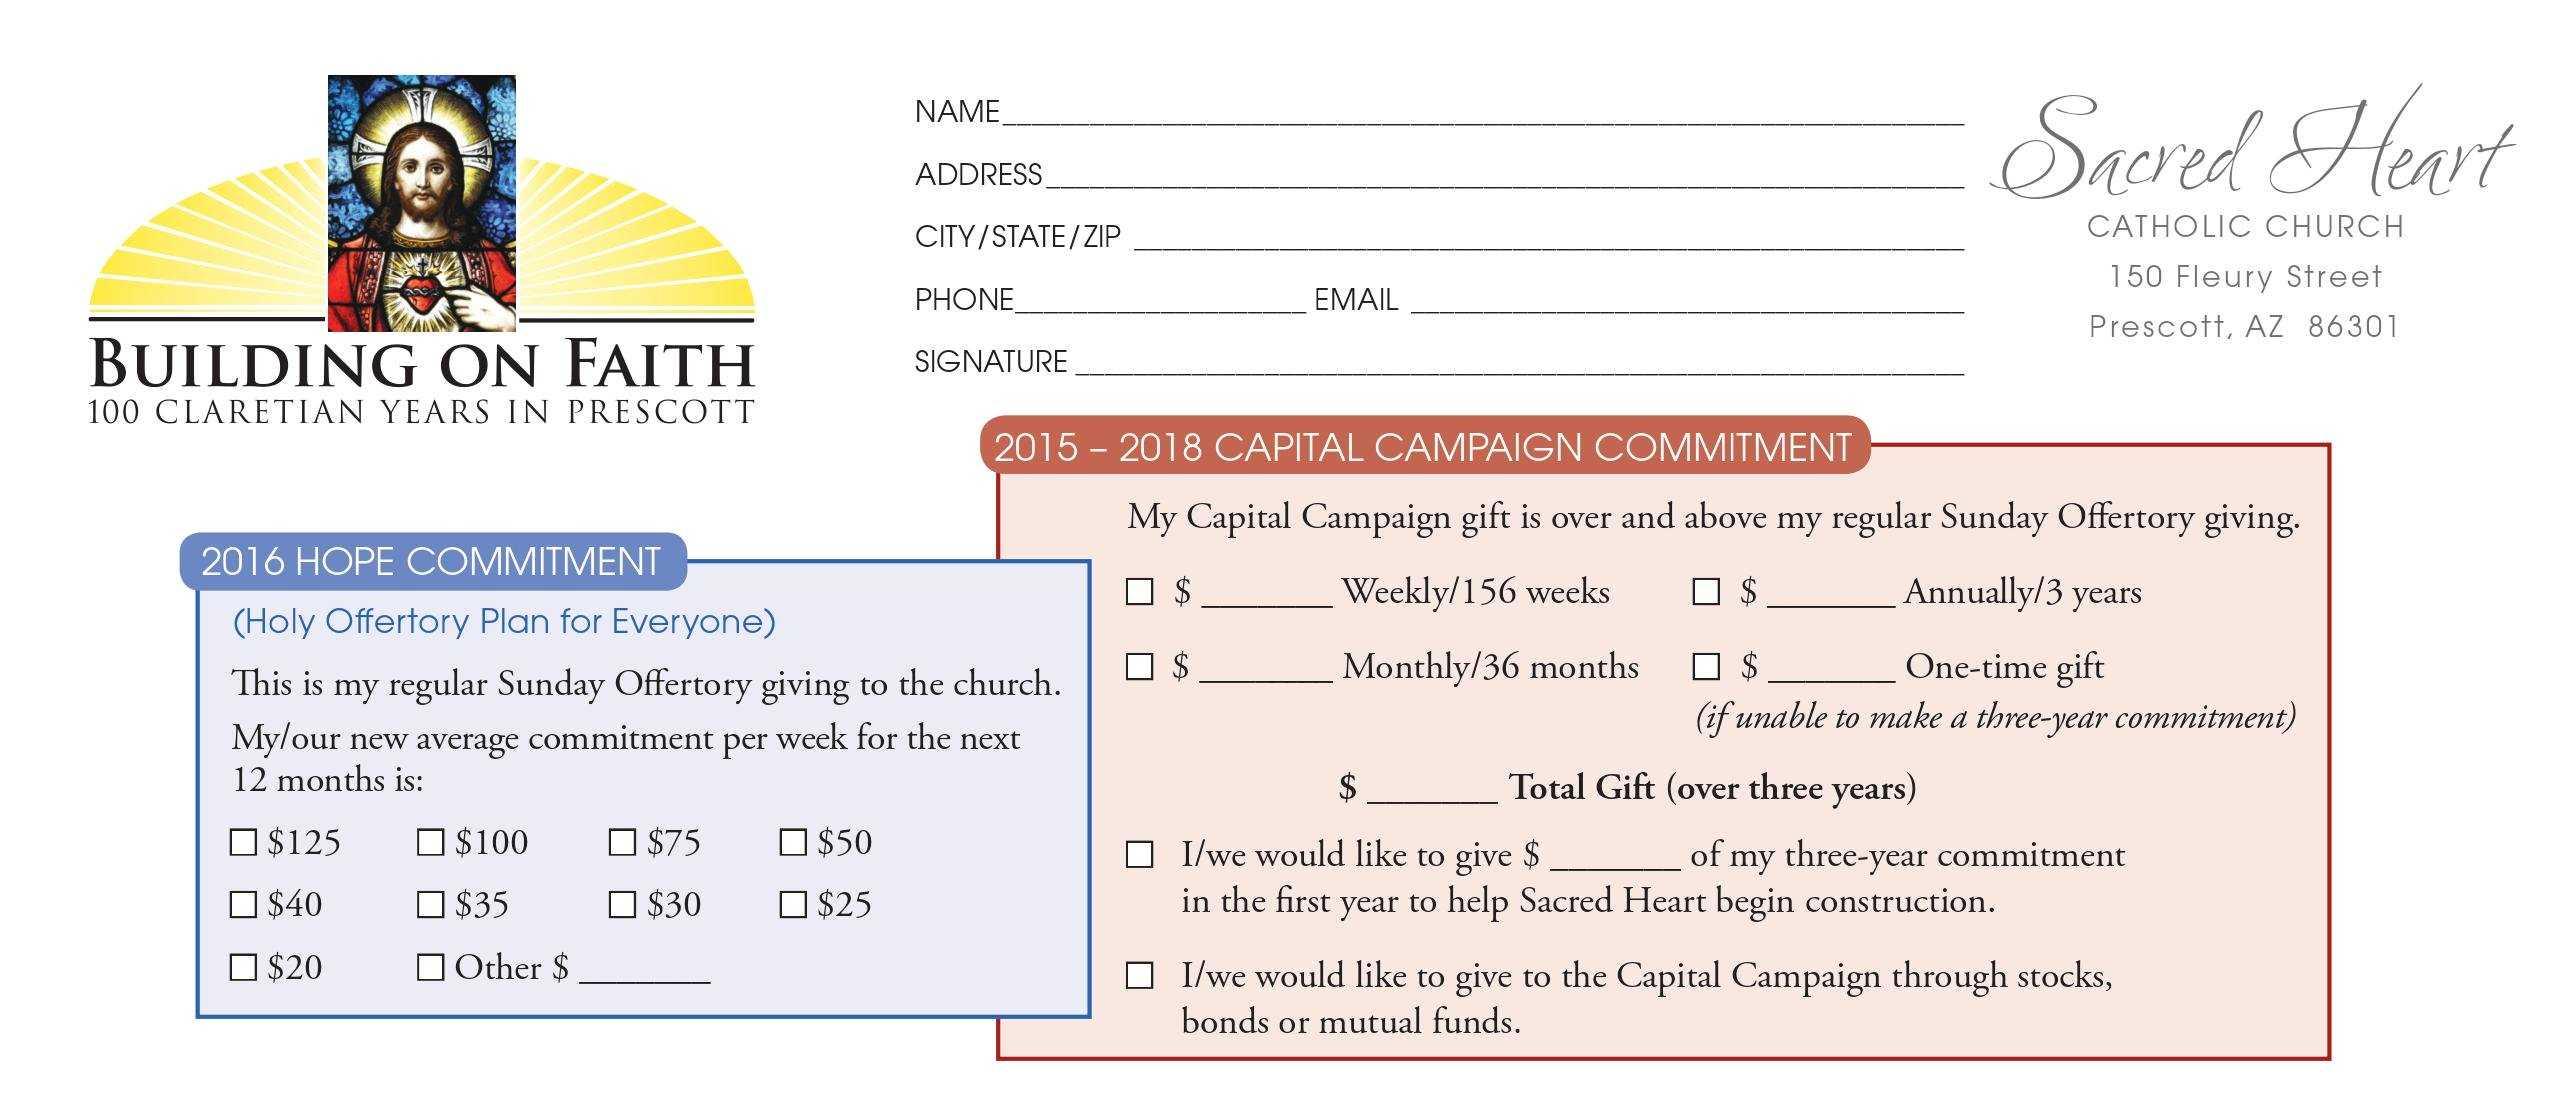 Pledge Card Sample - Colona.rsd7 For Fundraising Pledge Card Template